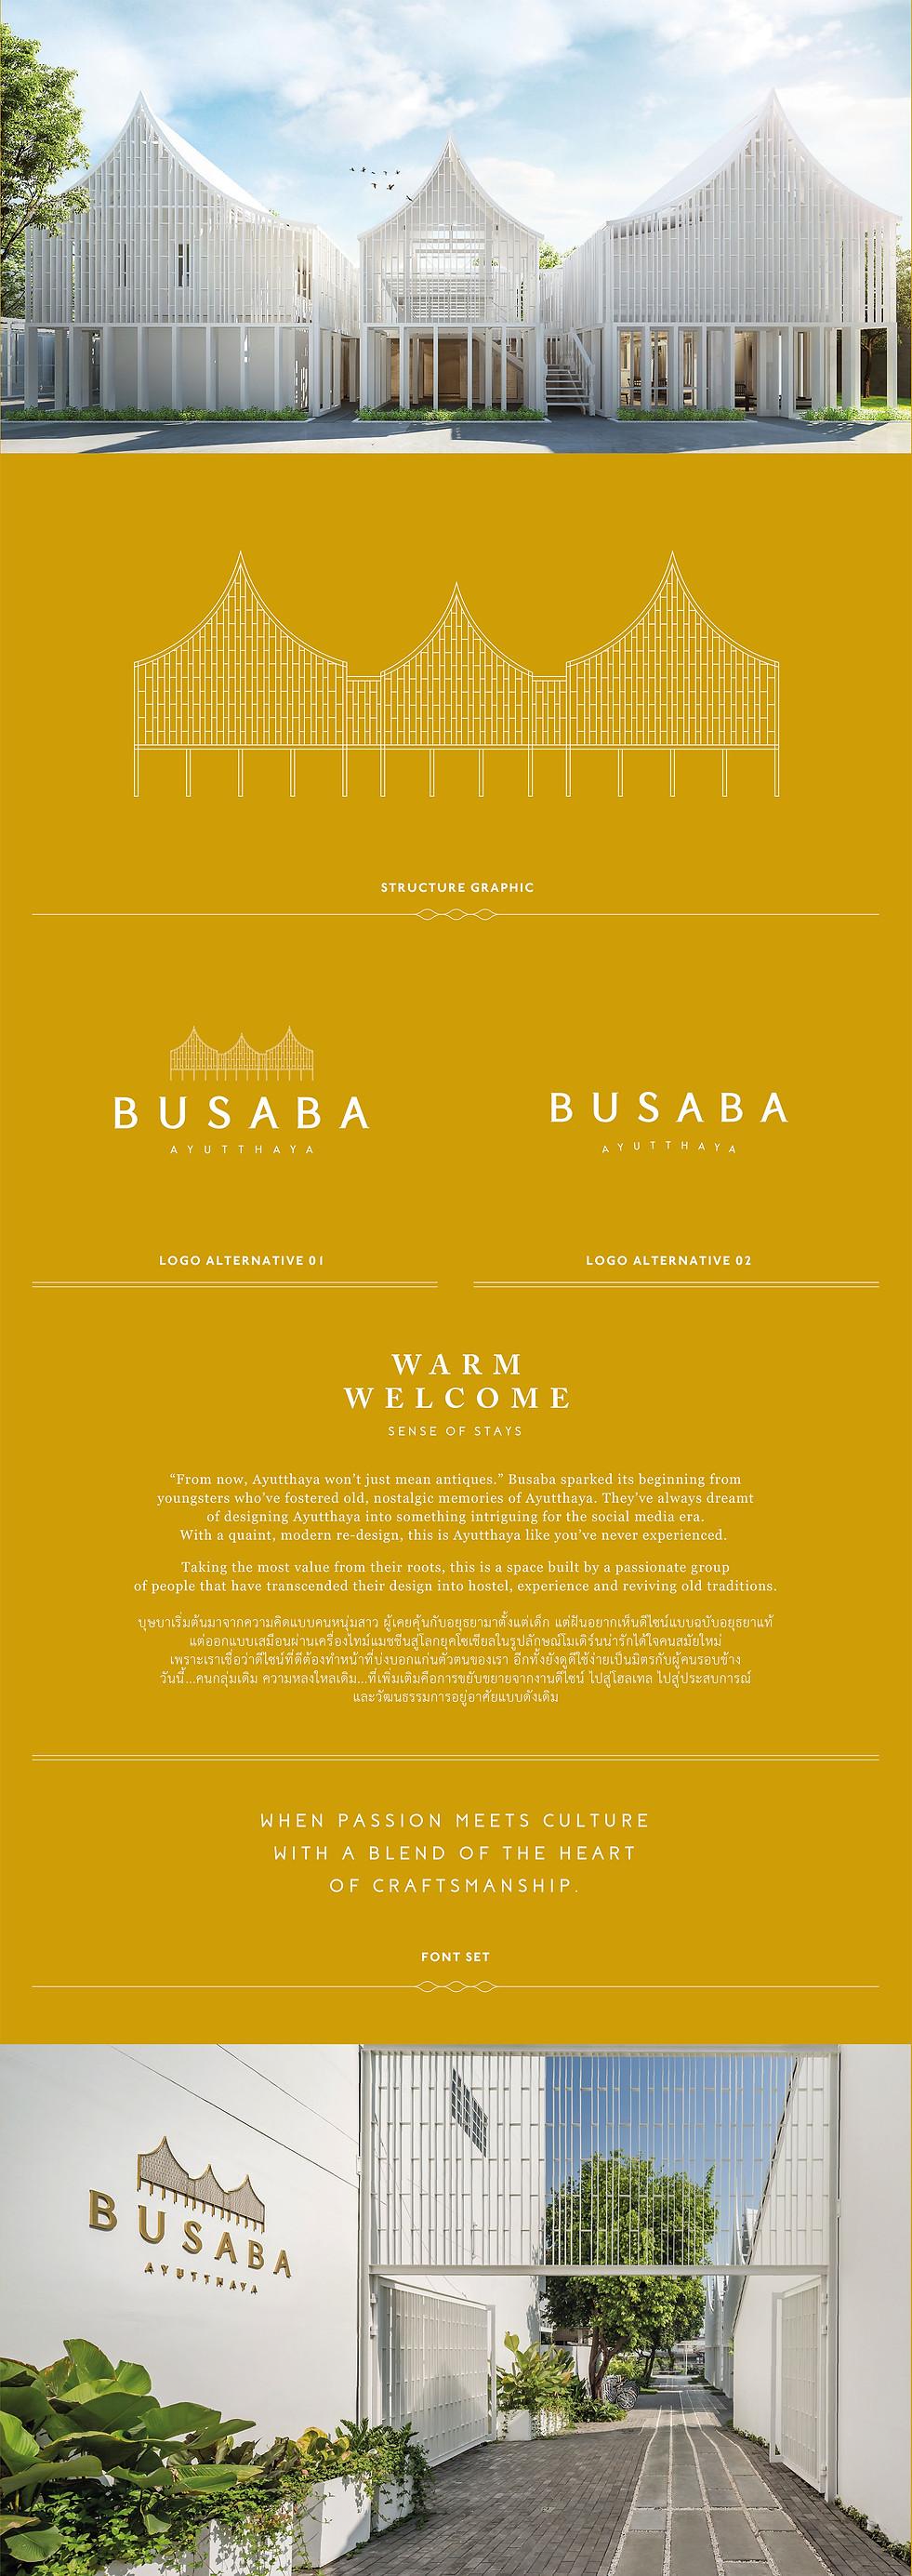 busaba hostel _ behance-04.jpg